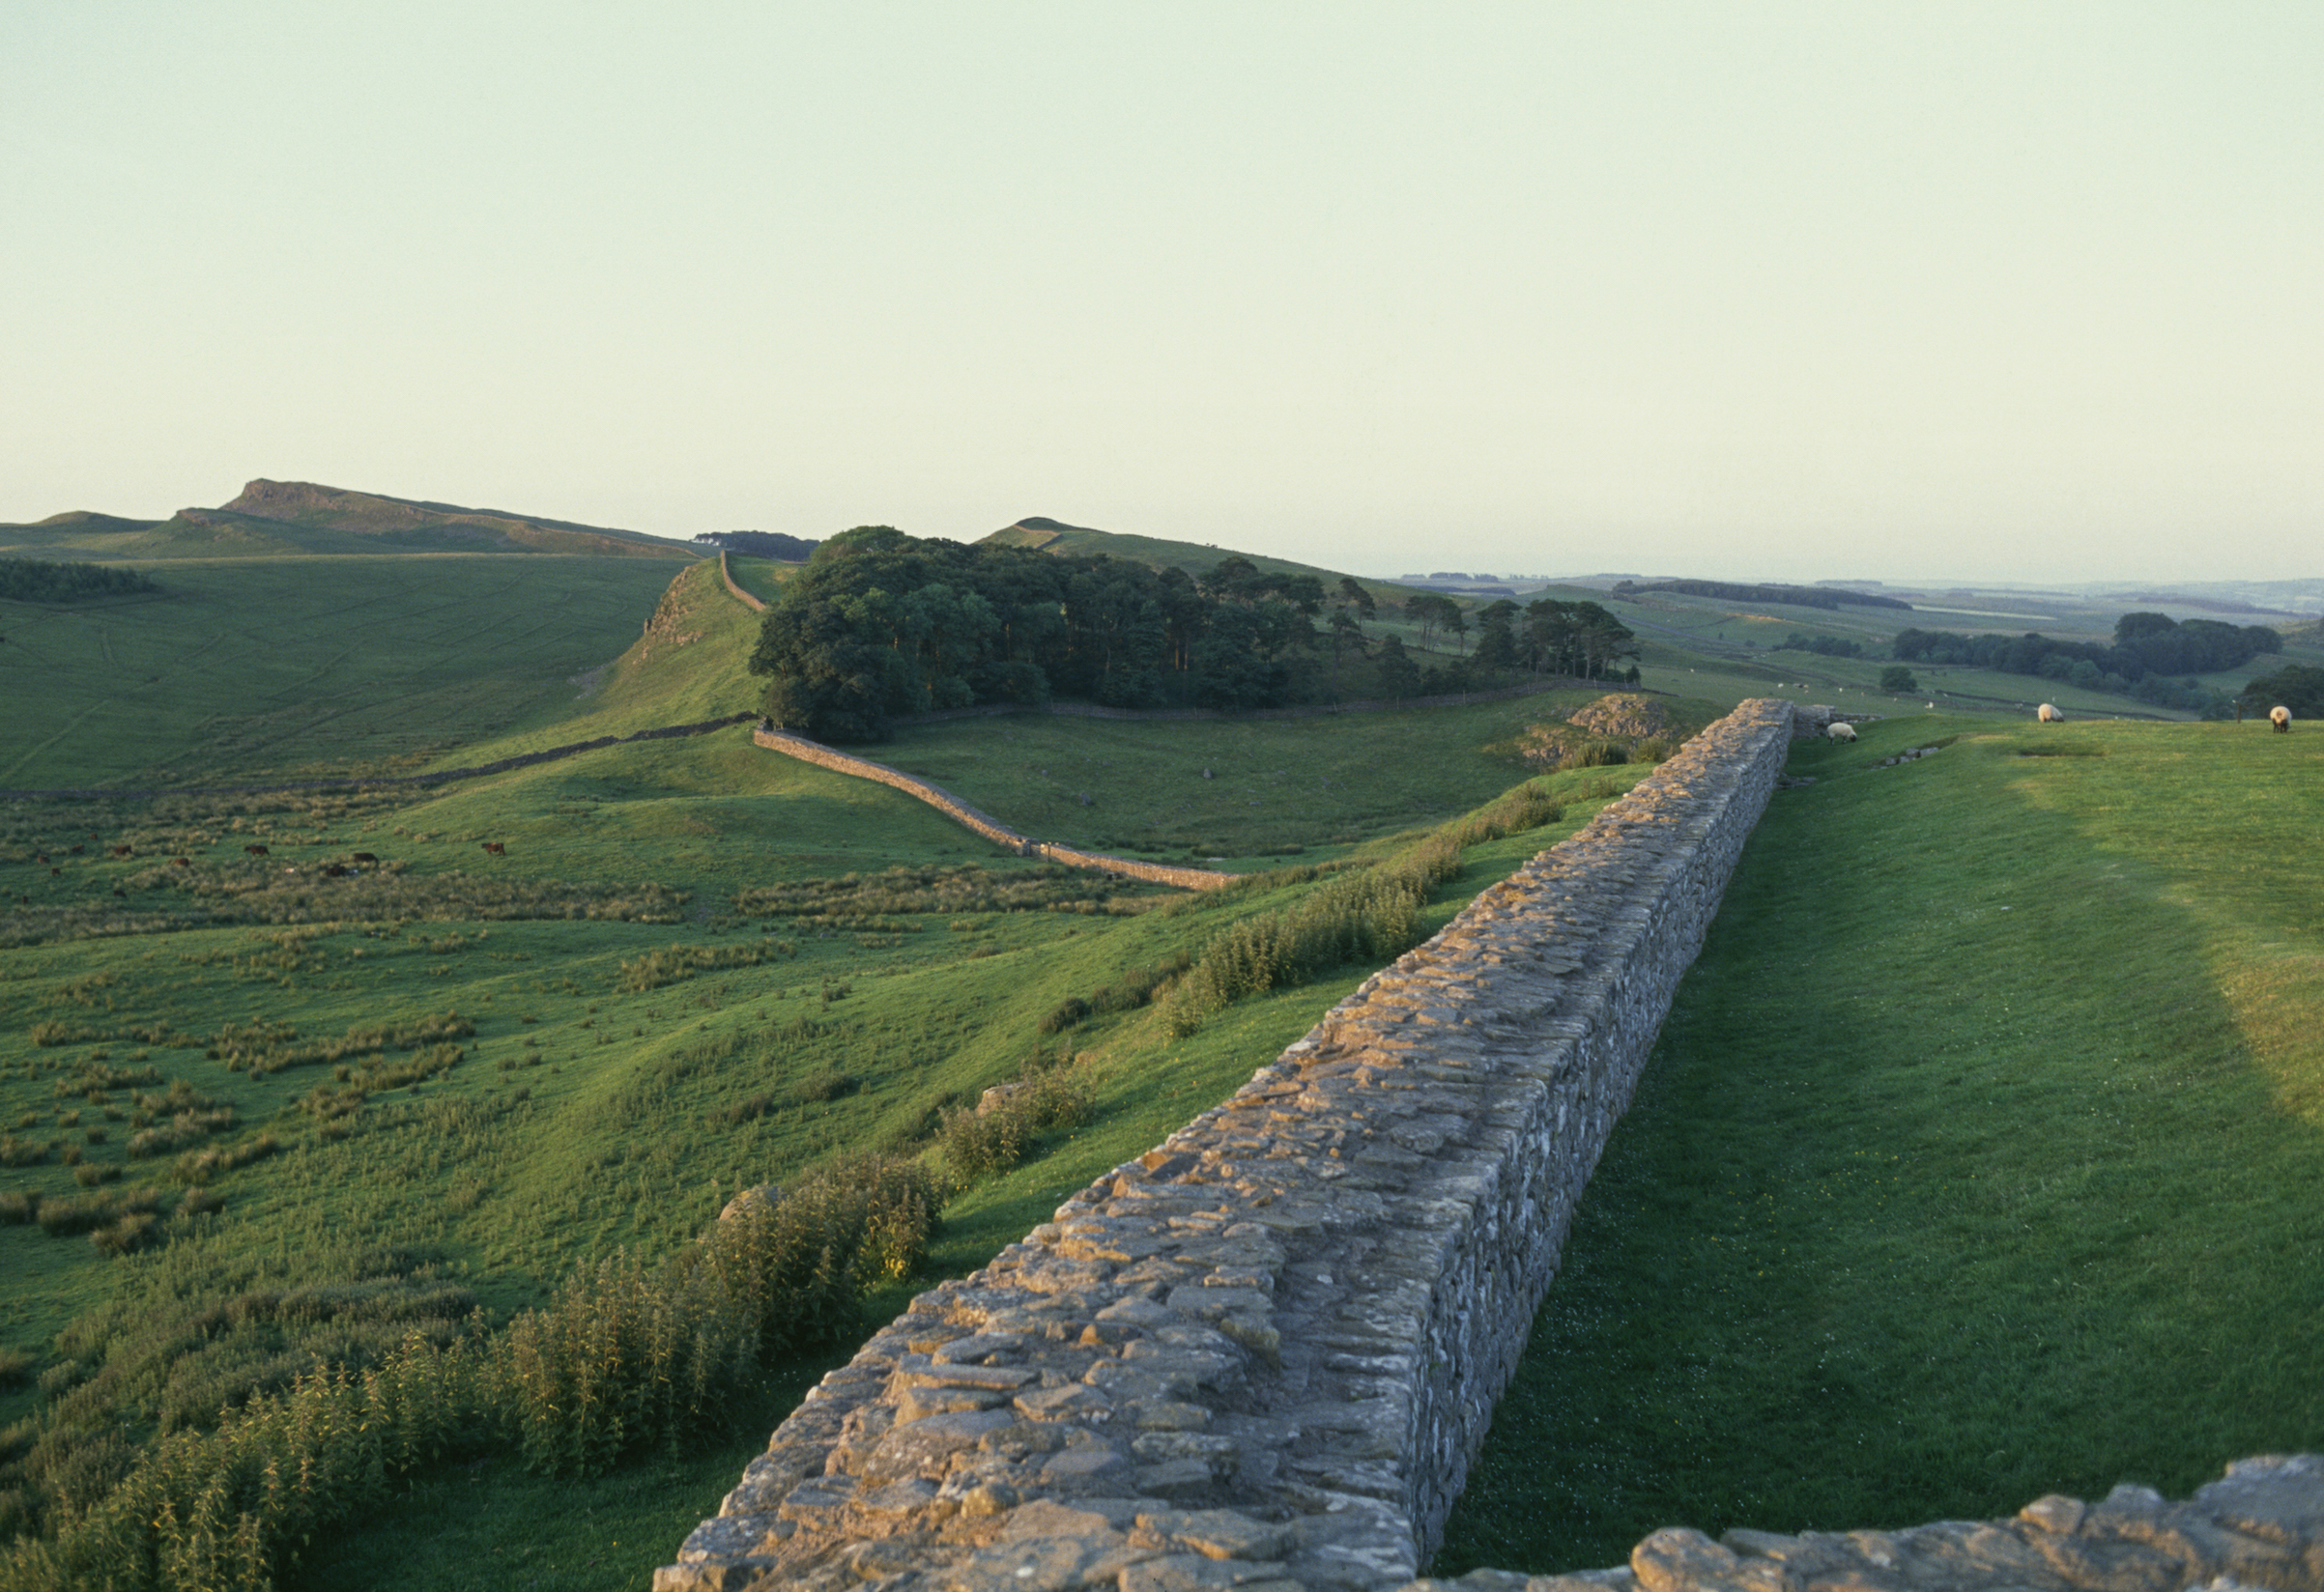 Hadrian's Wall (UNESCO World Heritage Site, 1987), seen near Housesteads, U.K.